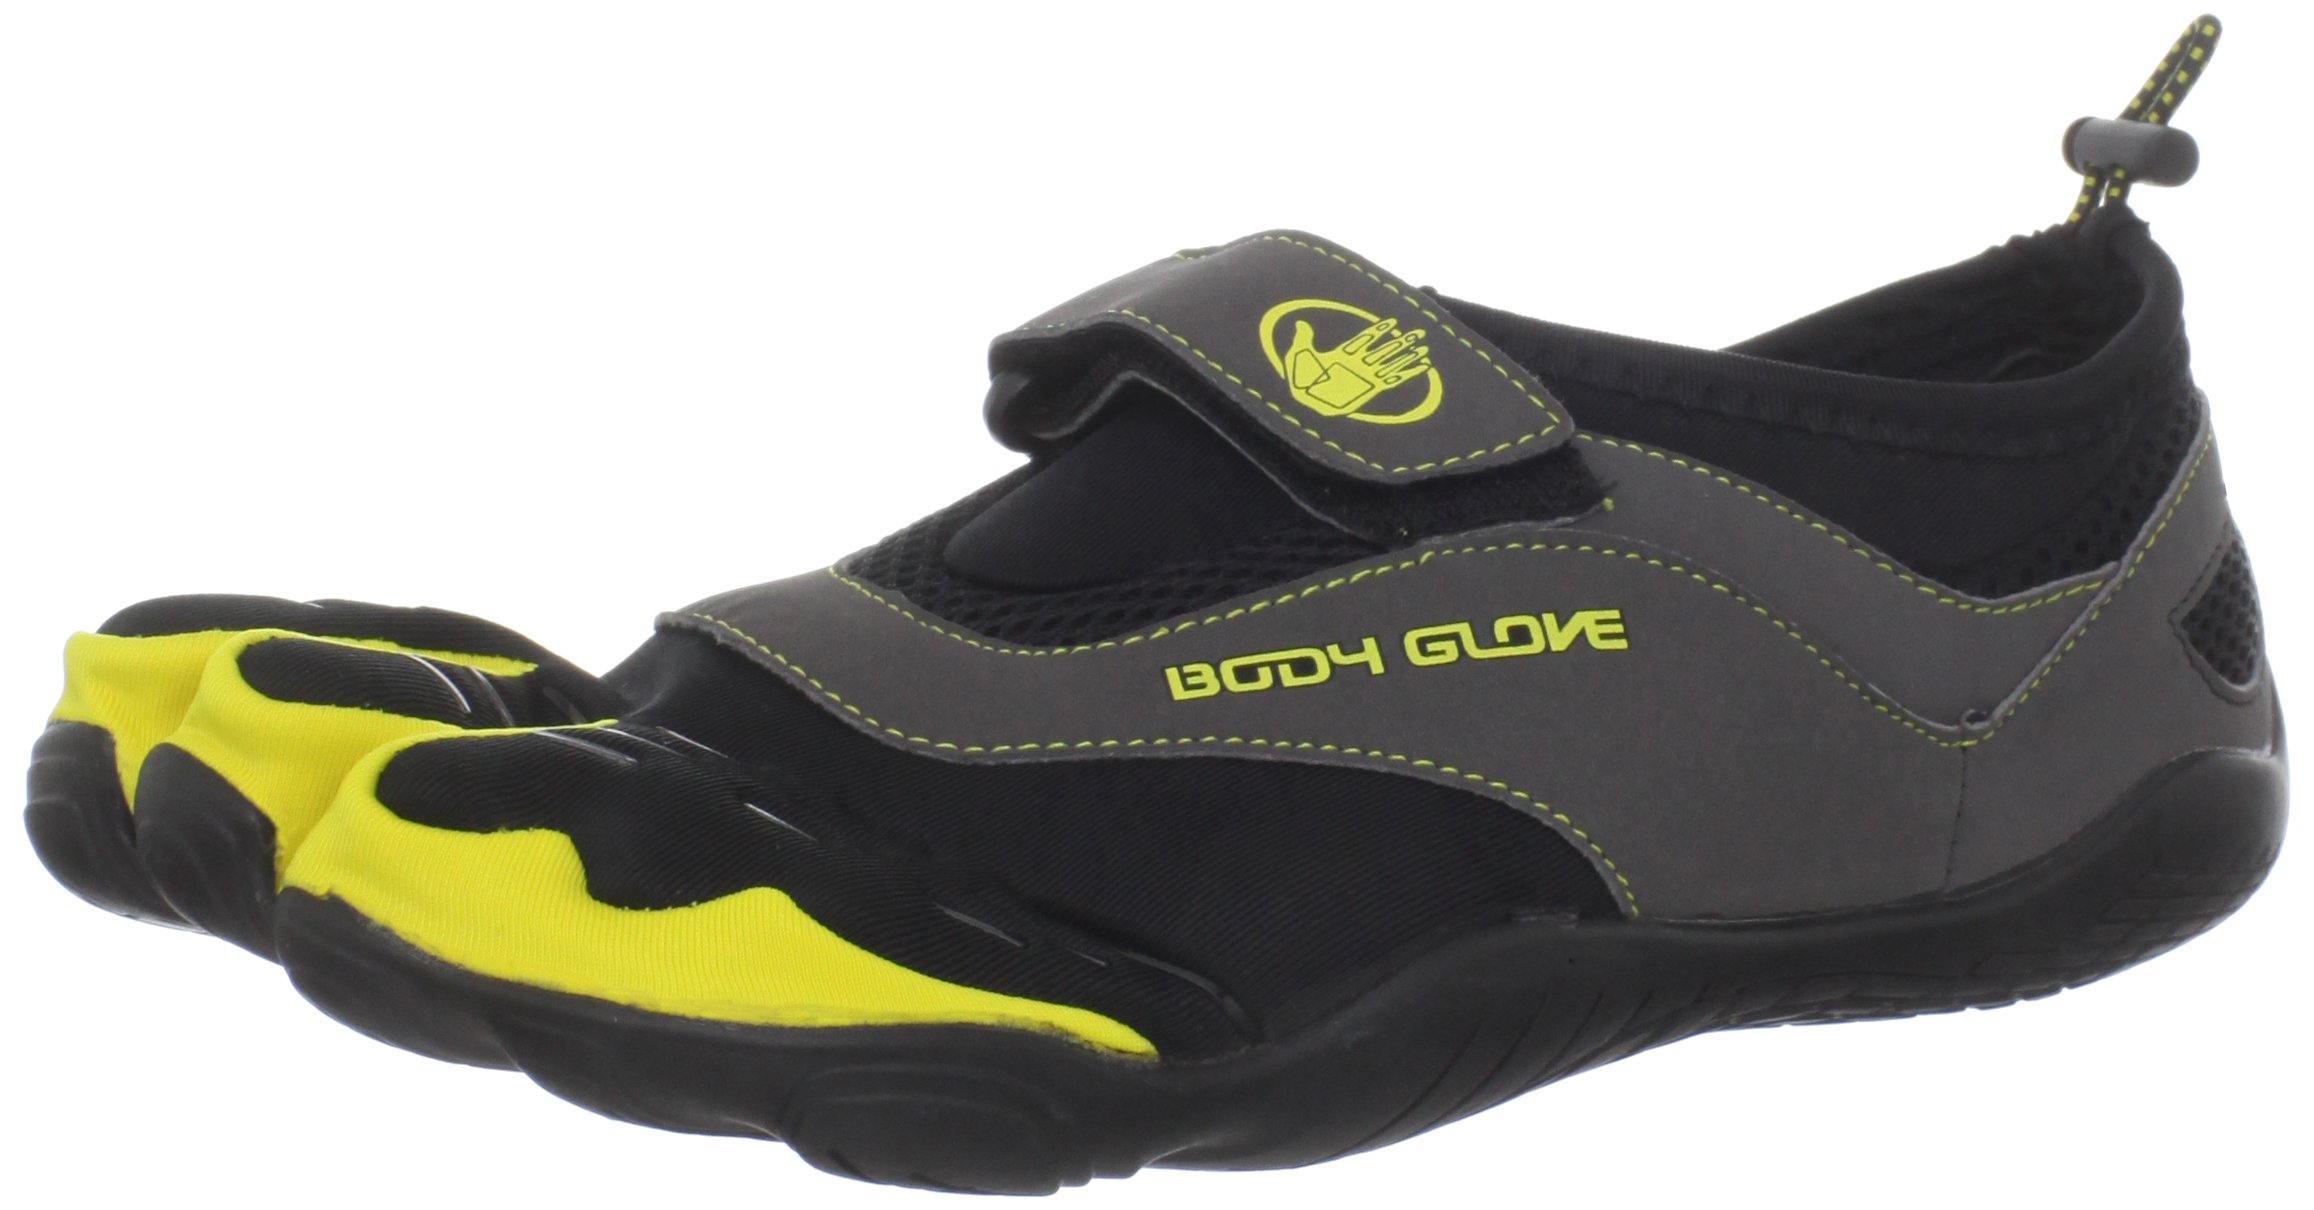 Body Glove Men's 3T Barefoot Max Water Shoe,Black/Yellow,8 M US